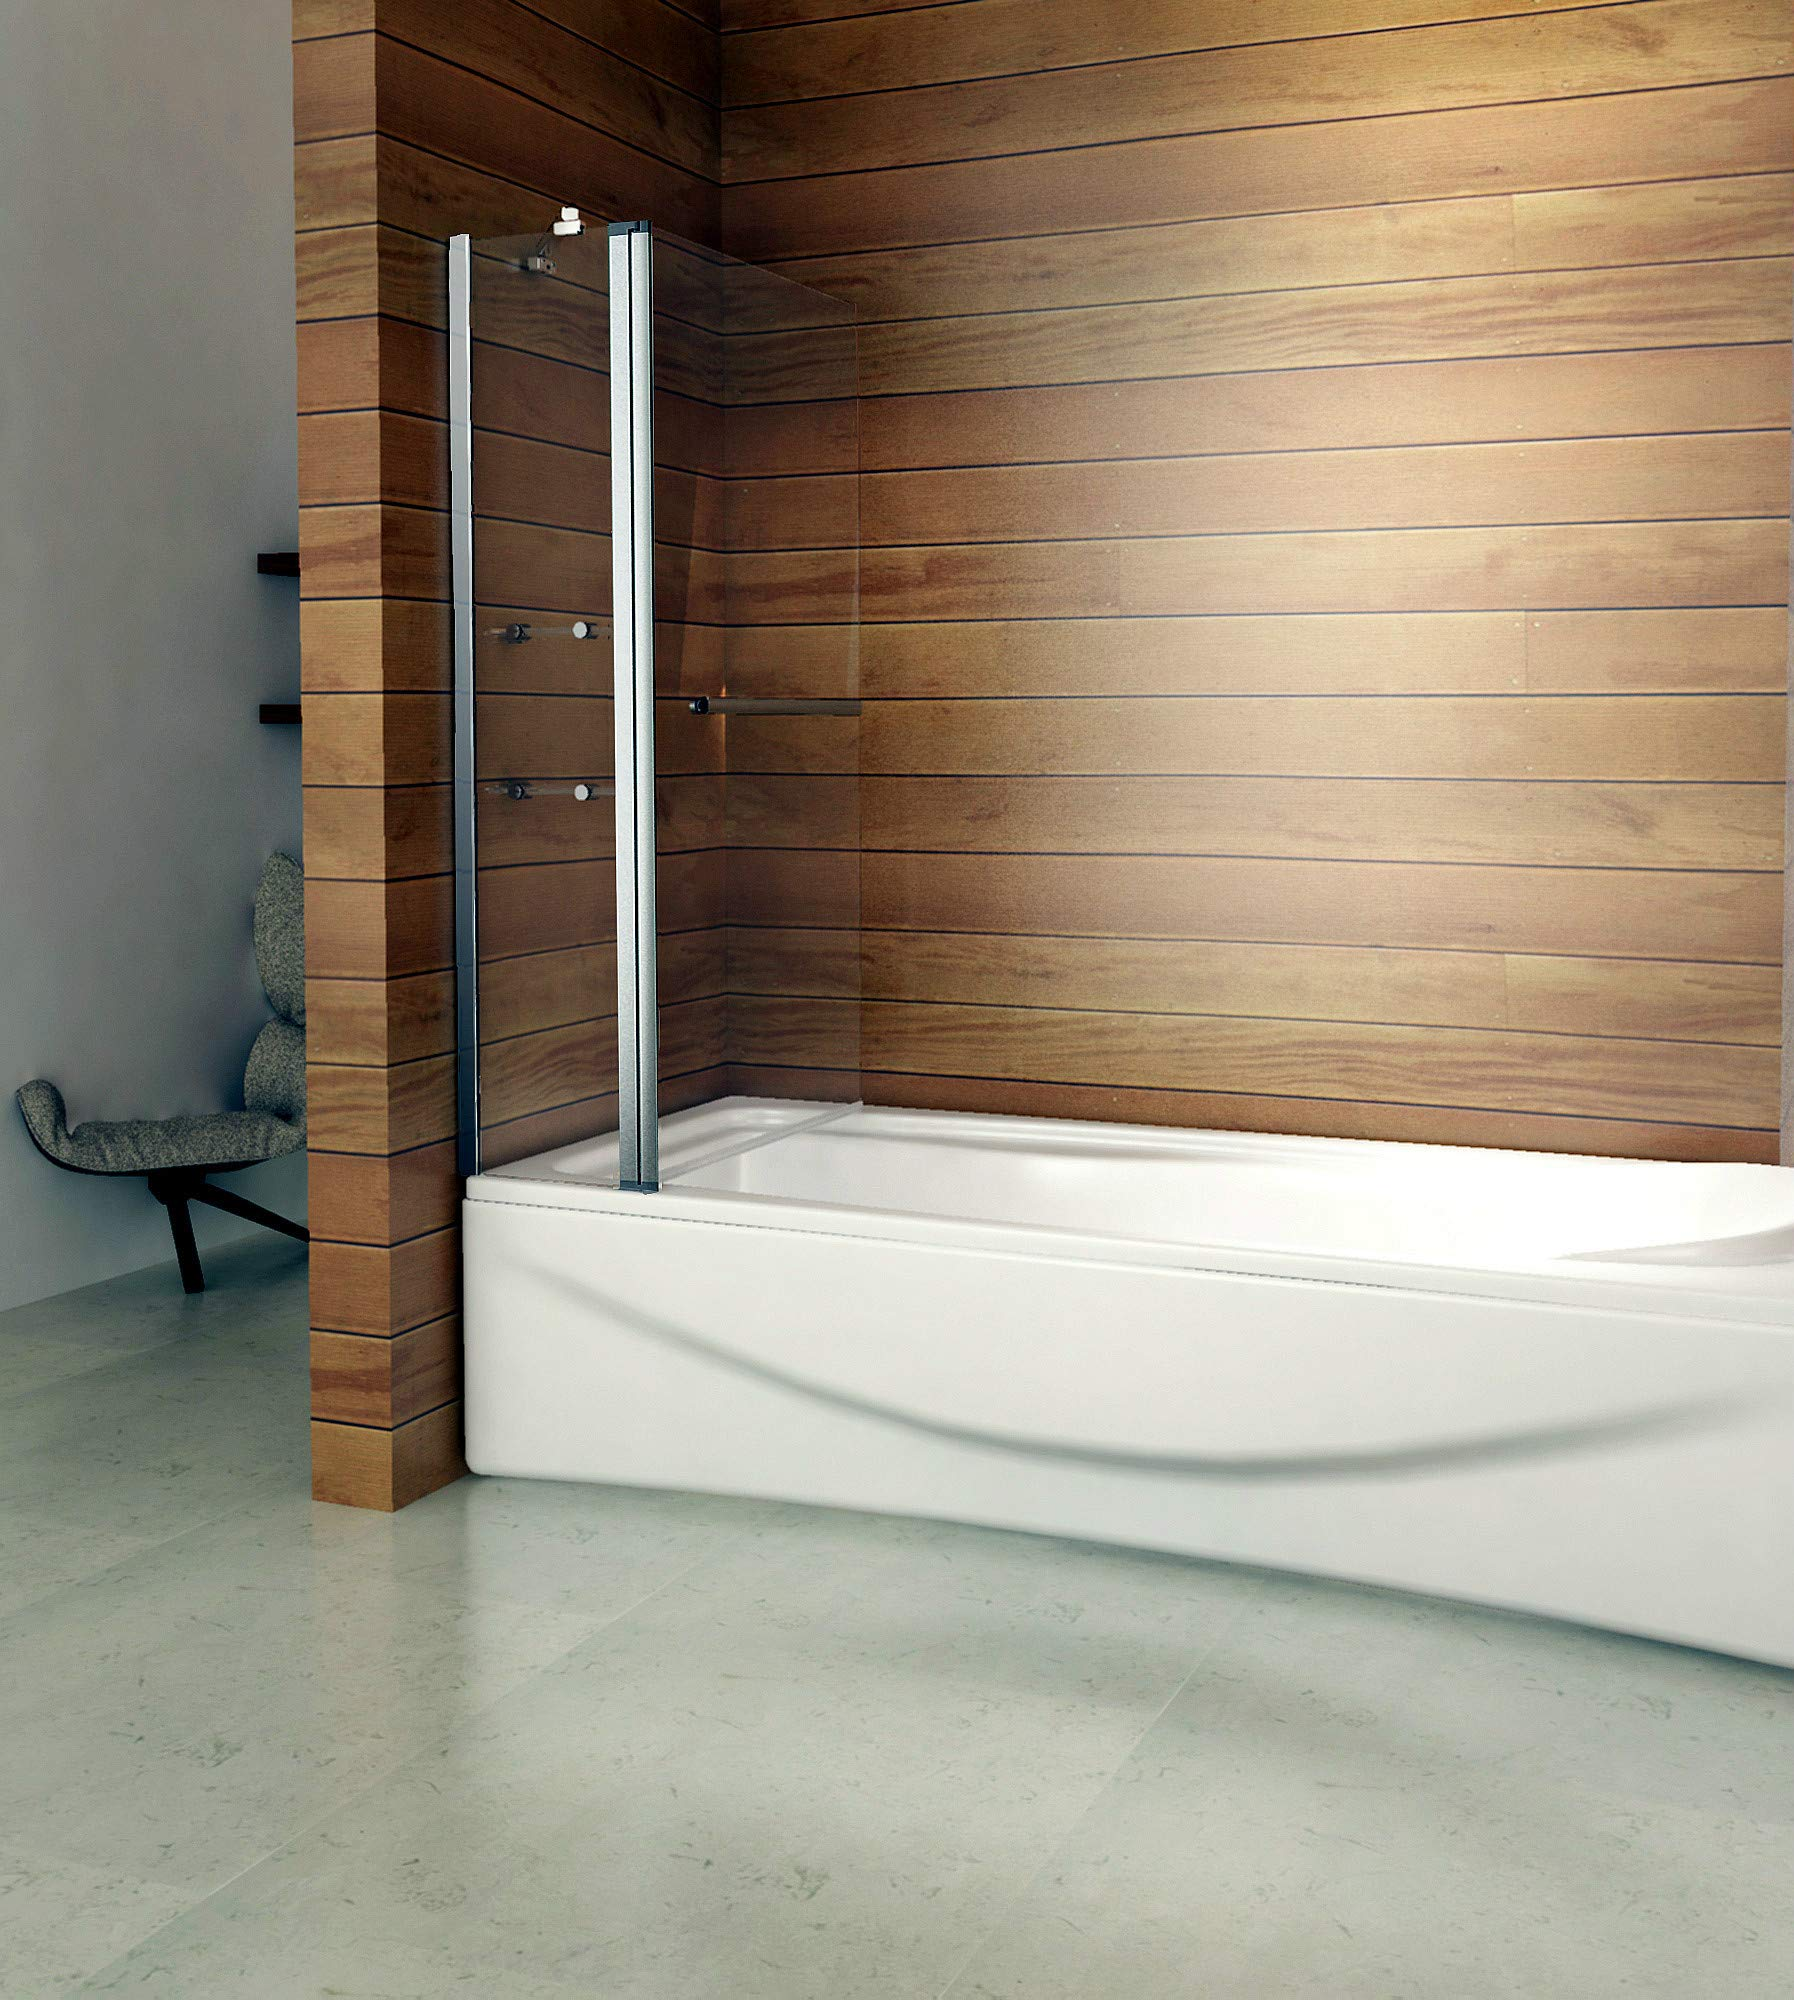 140 x 120 cm Mampara de bañera plegable pared ducha de pared para ...